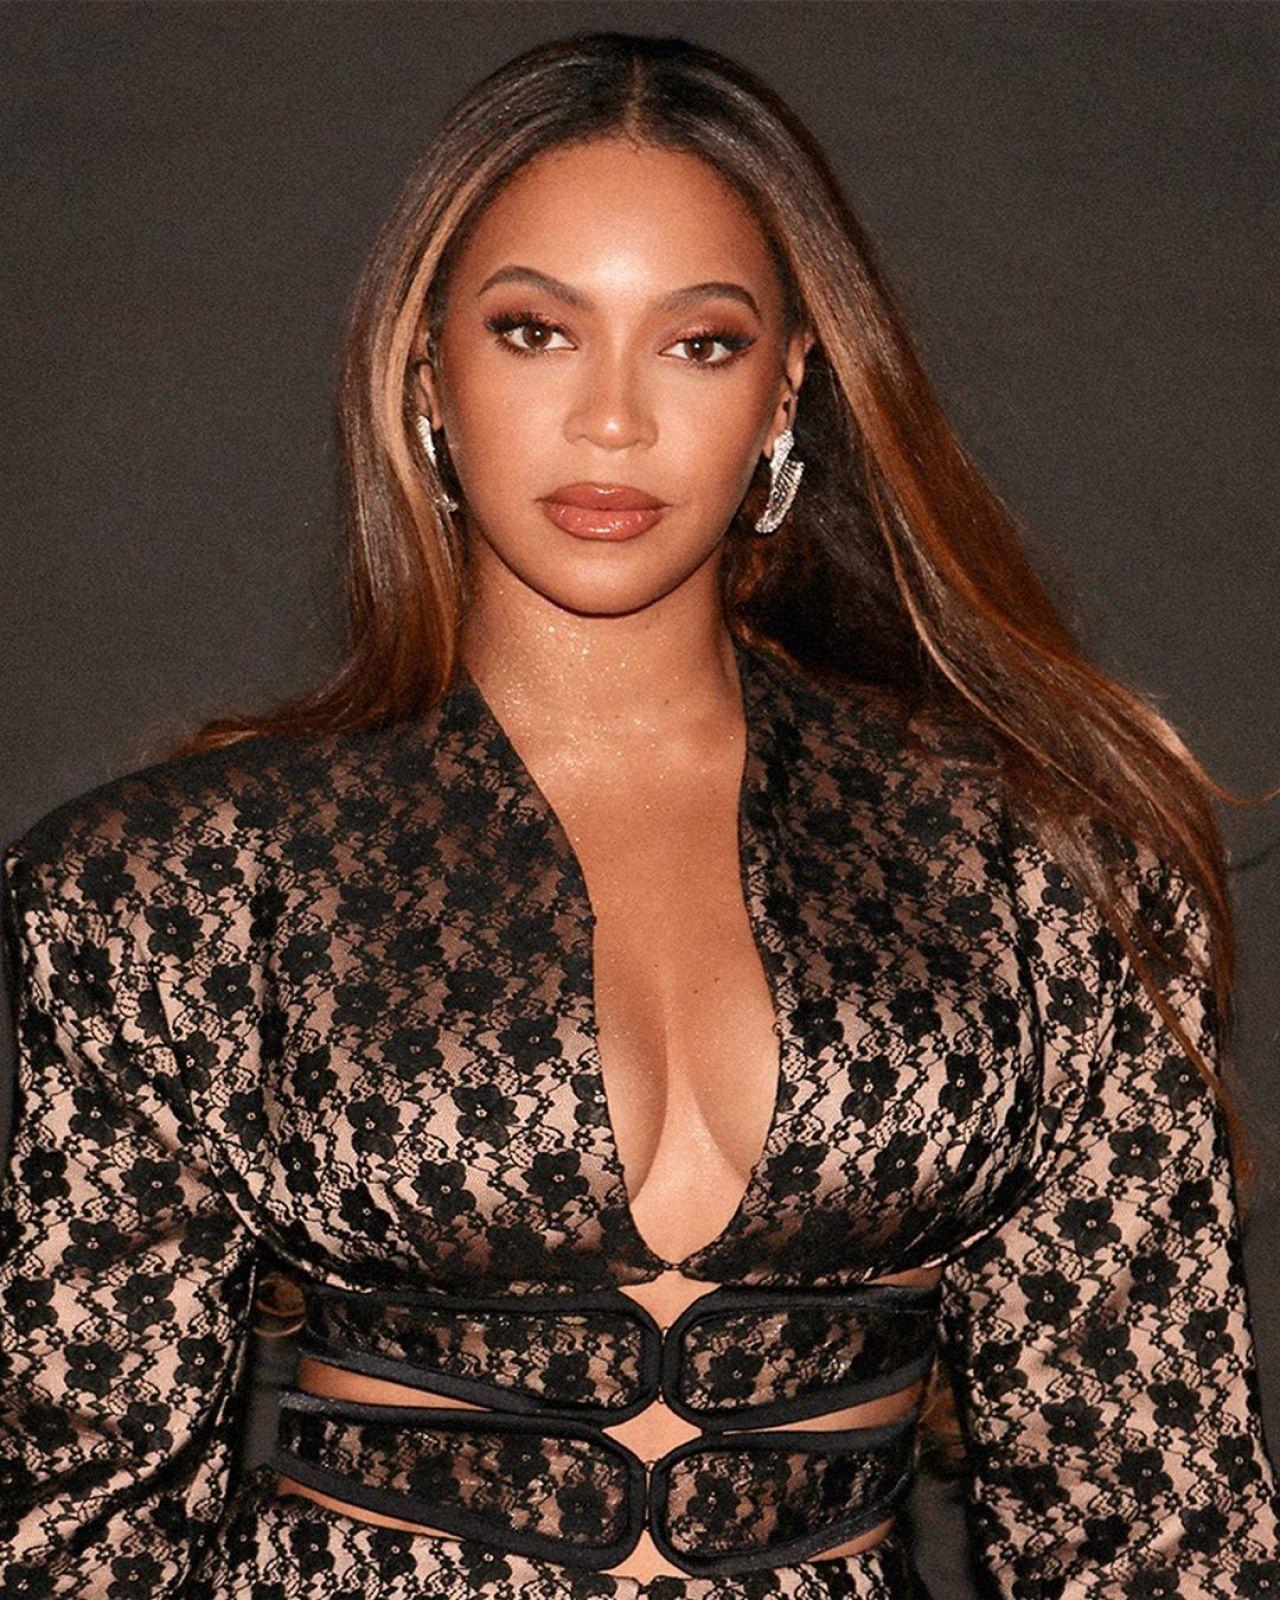 Beyonce Knowles - Beyonce Knowles Photos - 2006 American